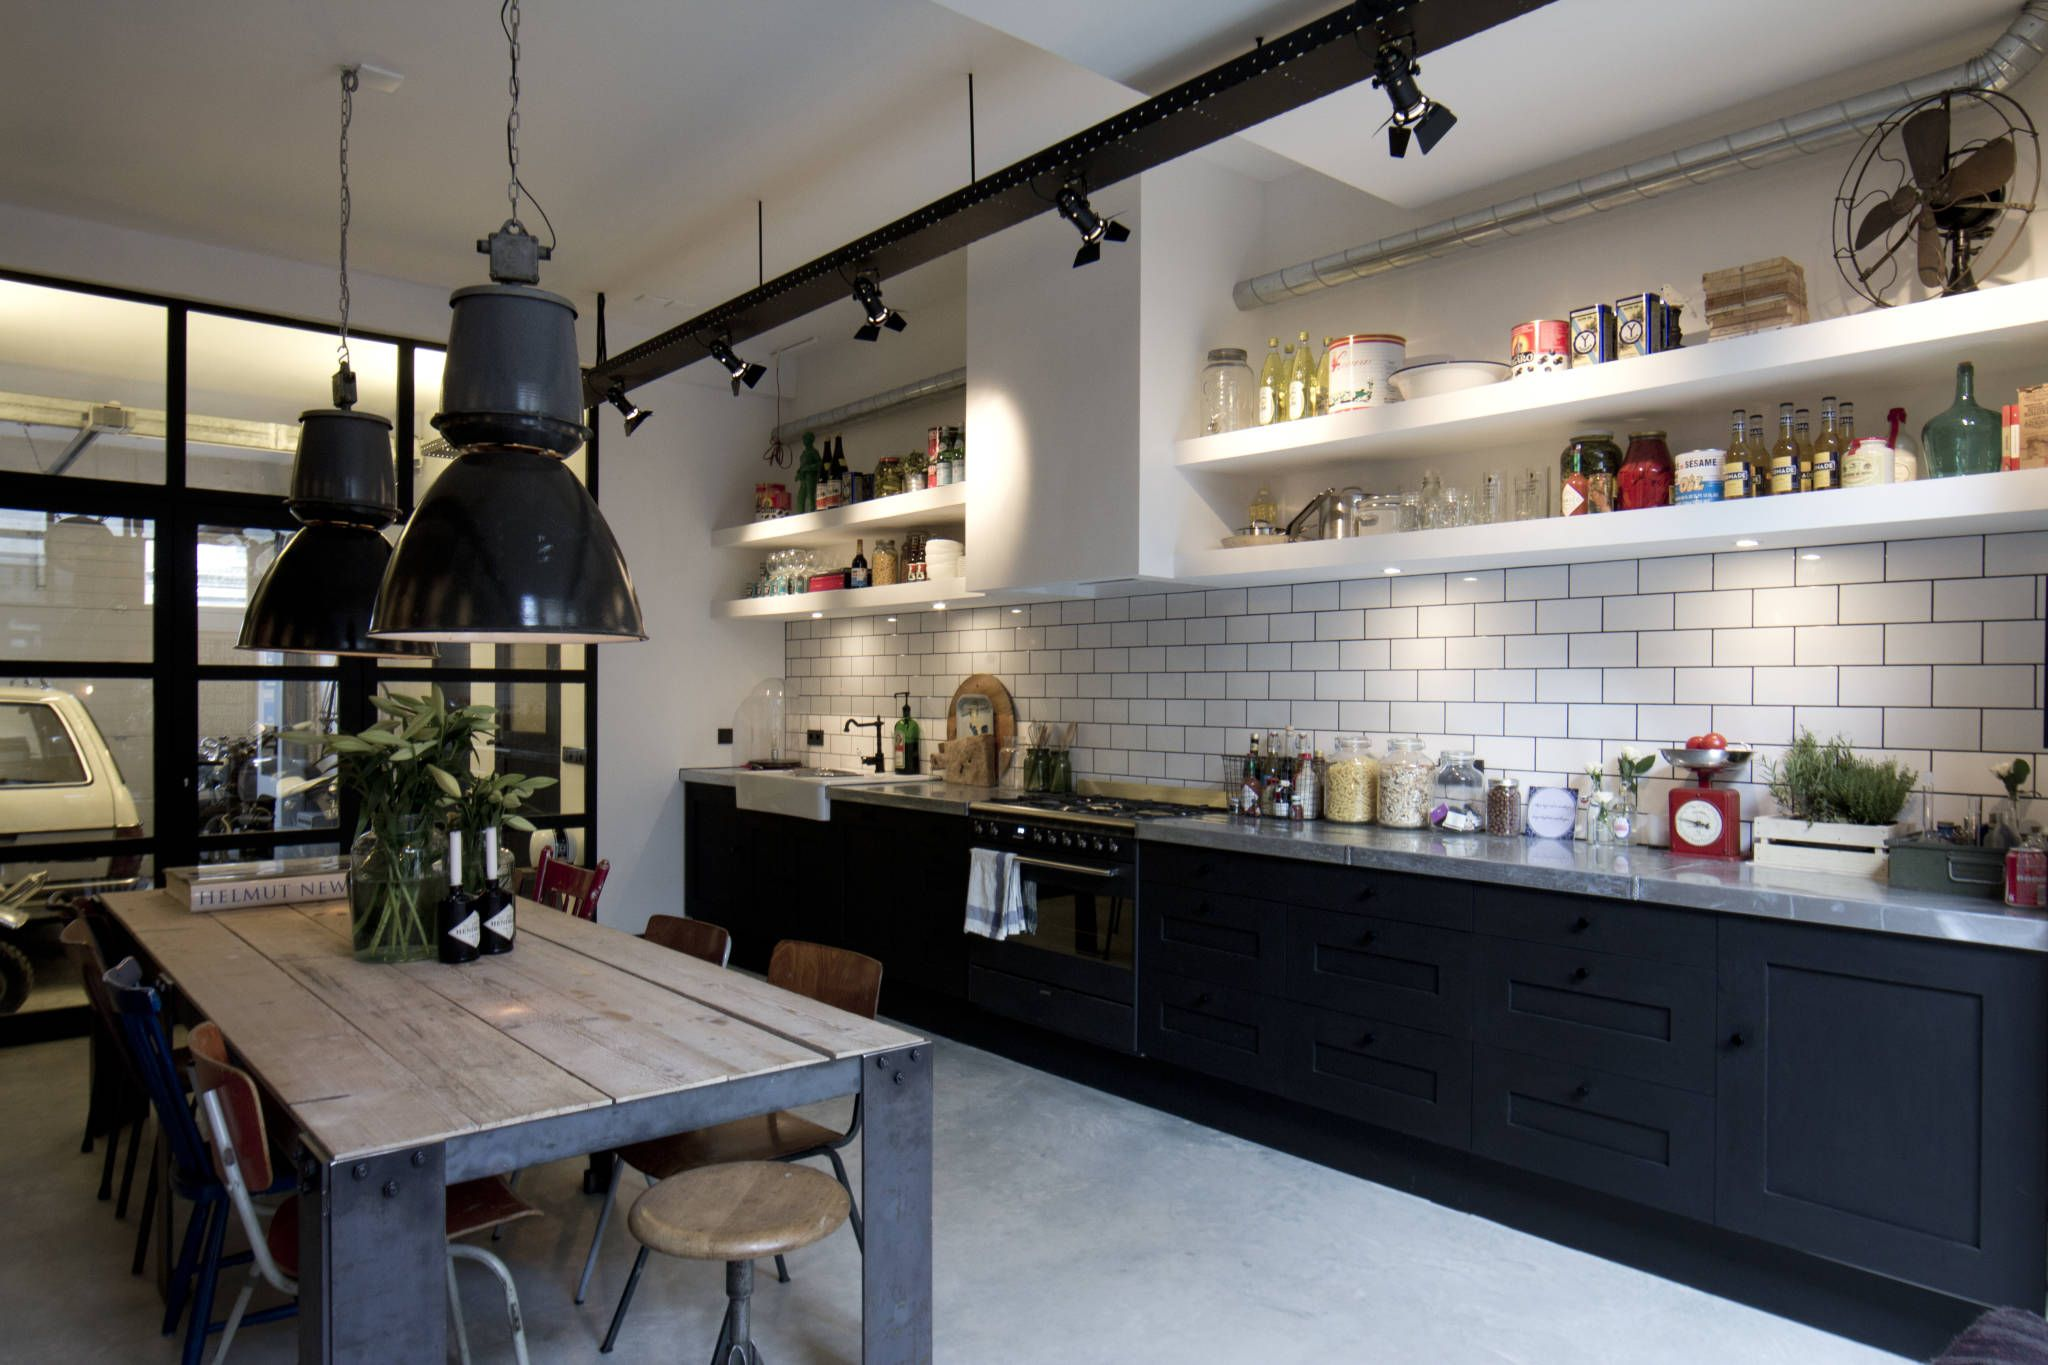 best 25 brick studio ideas only on pinterest studio apartments best 25 brick studio ideas only on pinterest studio apartments brick bedroom and cozy apartment